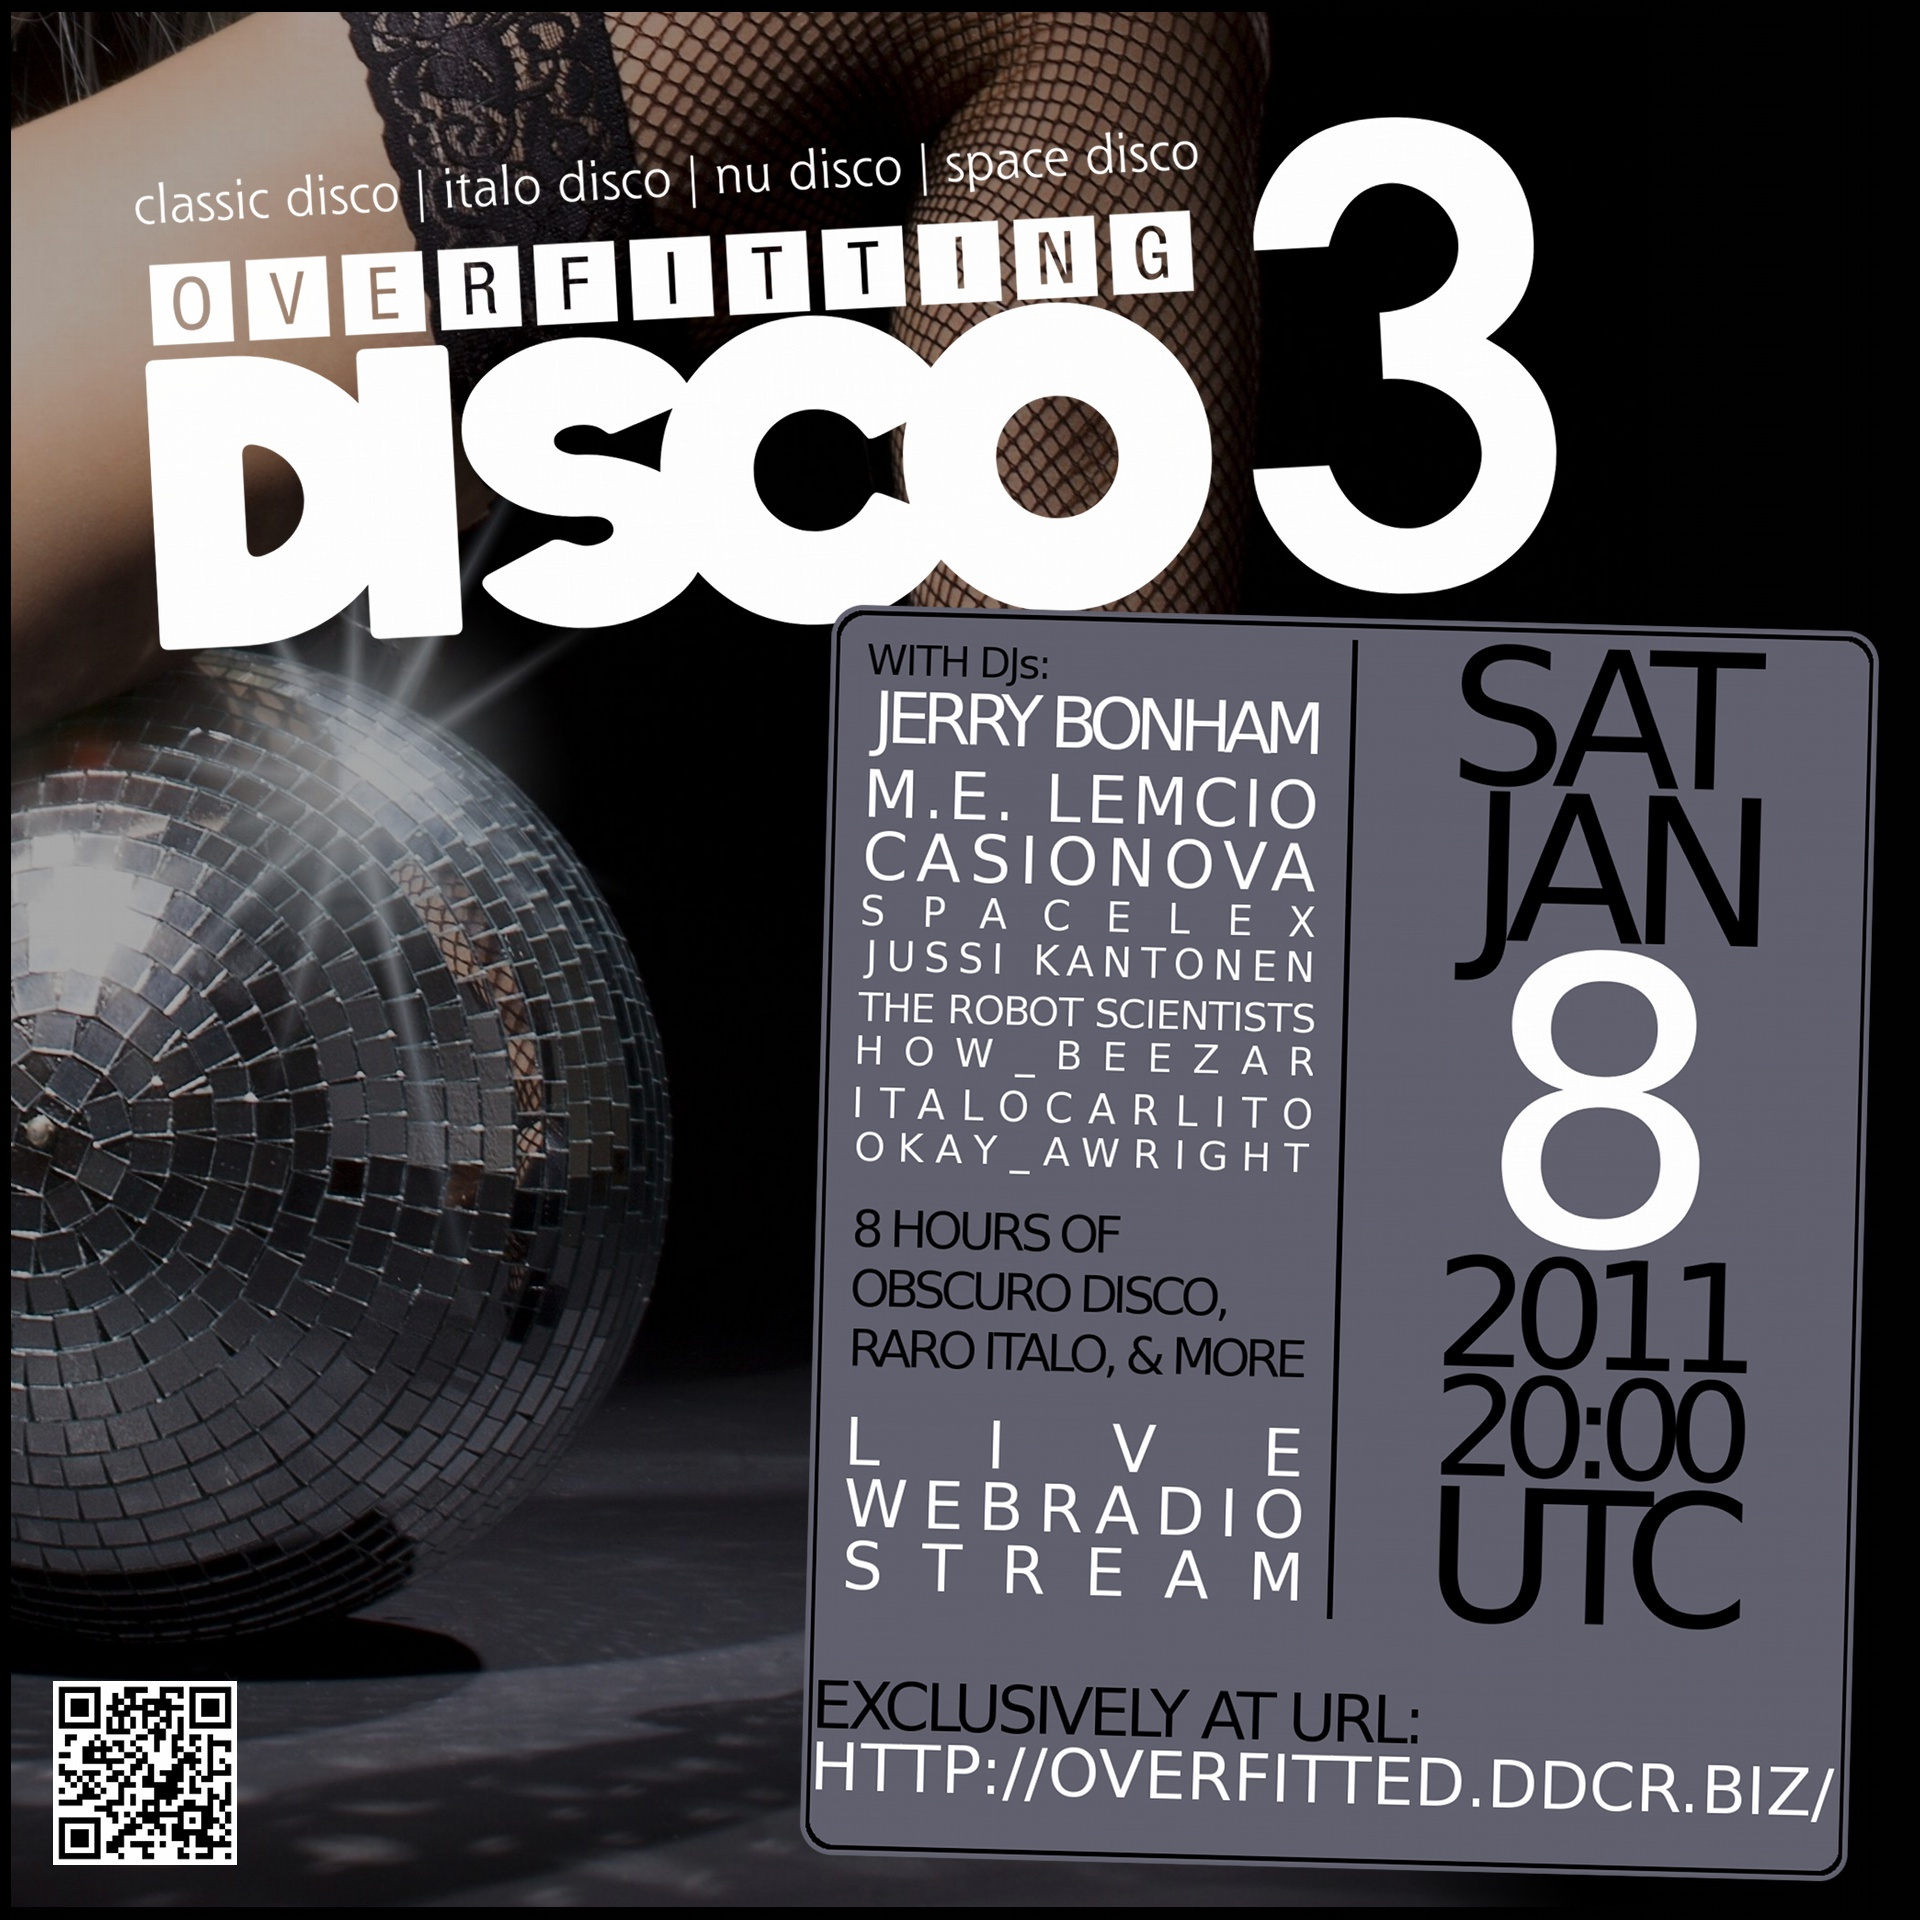 overfitting-disco3flyer102shrinked_med